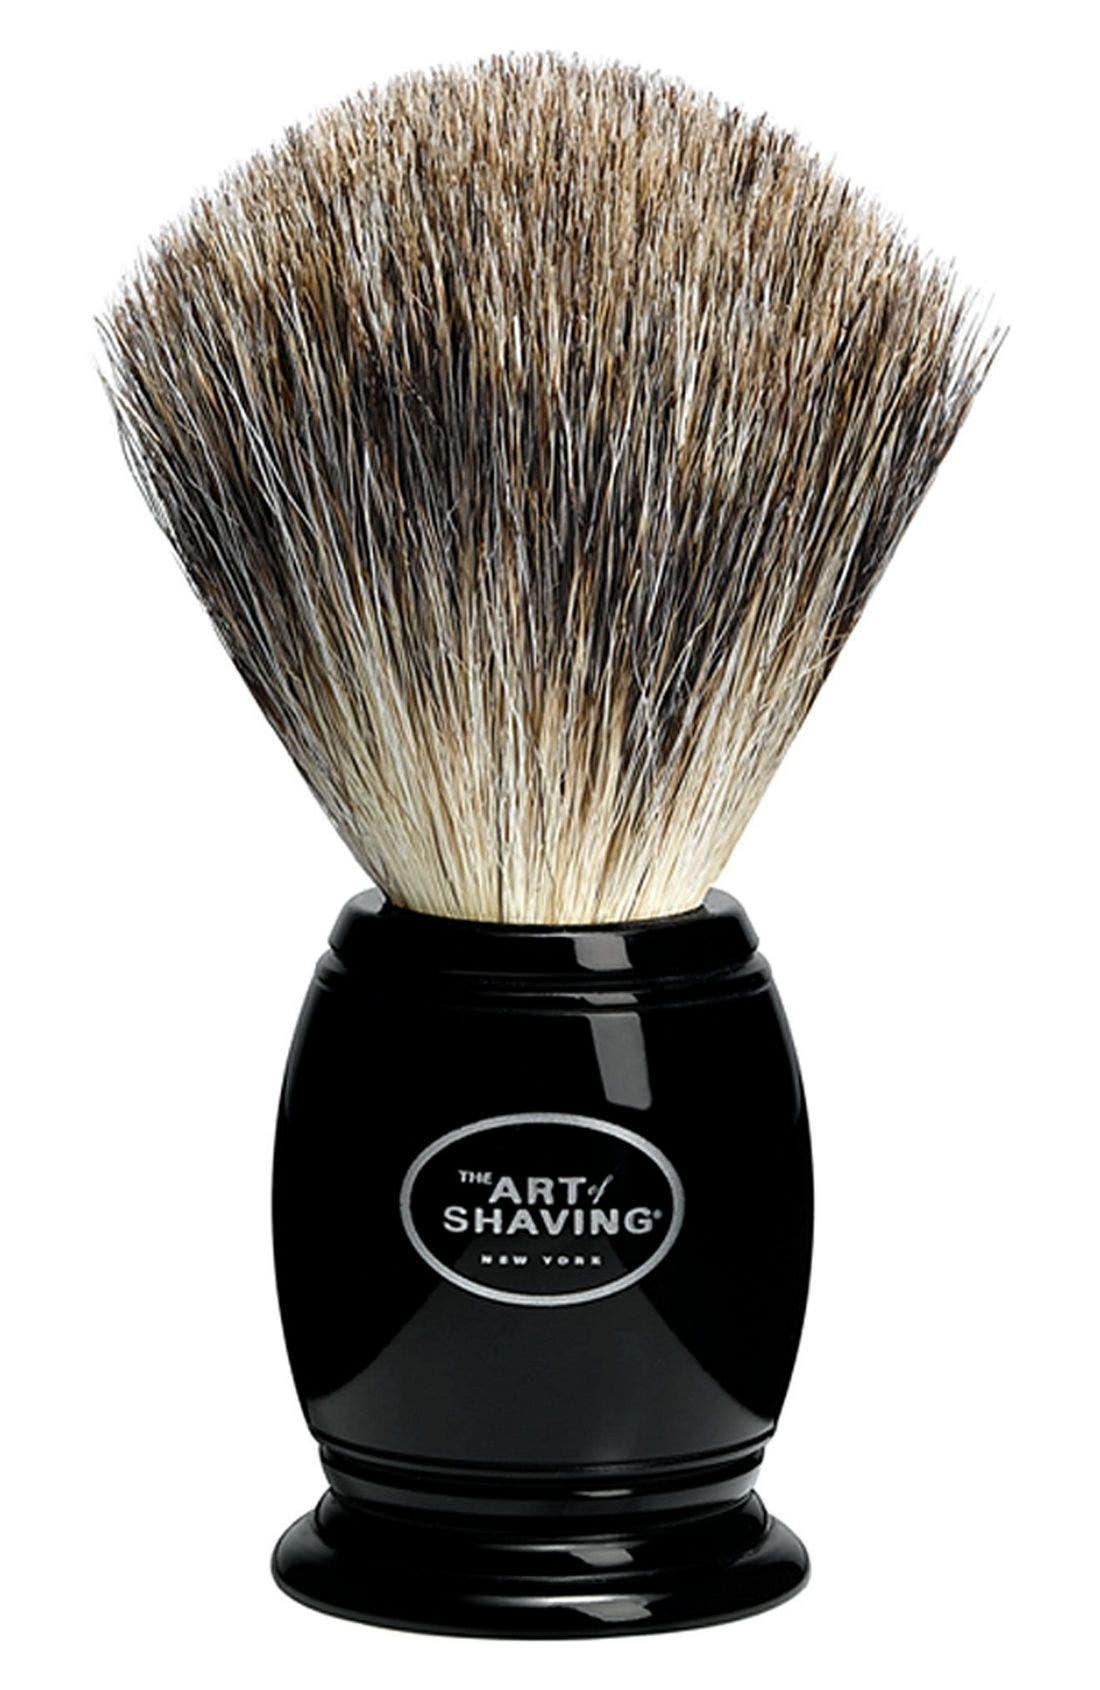 THE ART OF SHAVING,                              Pure Badger Shaving Brush,                             Main thumbnail 1, color,                             000